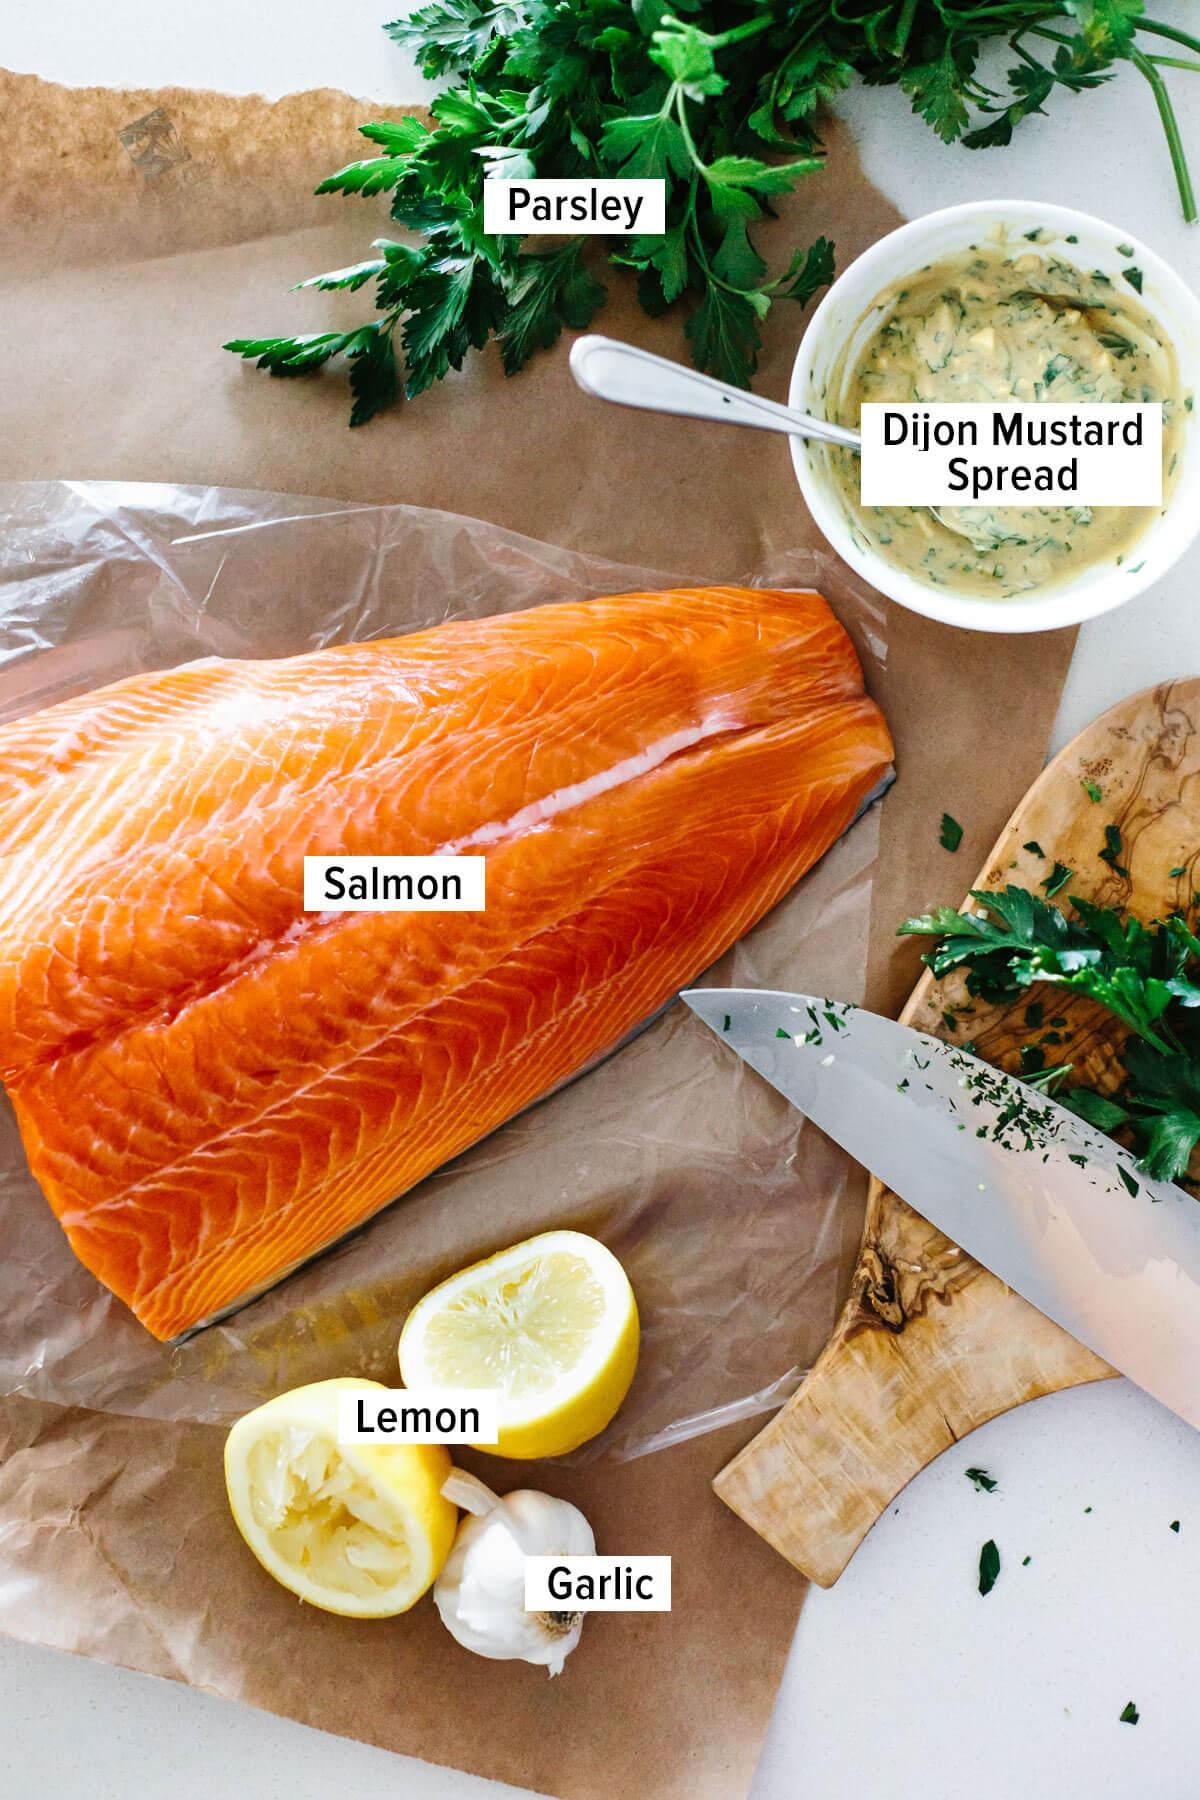 Ingredients to make Dijon baked salmon on a table.